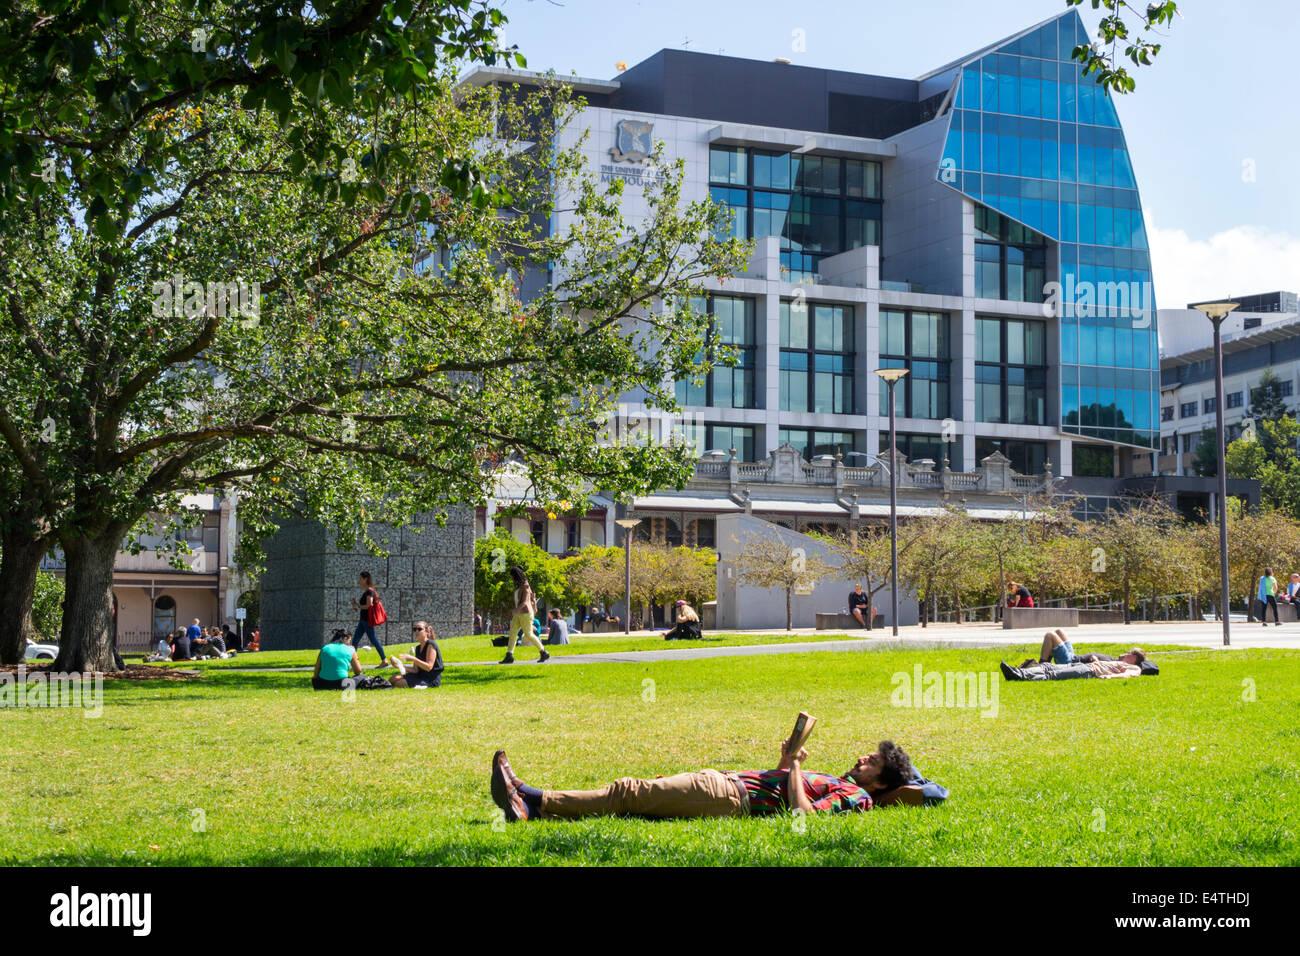 free online dating melbourne australia university